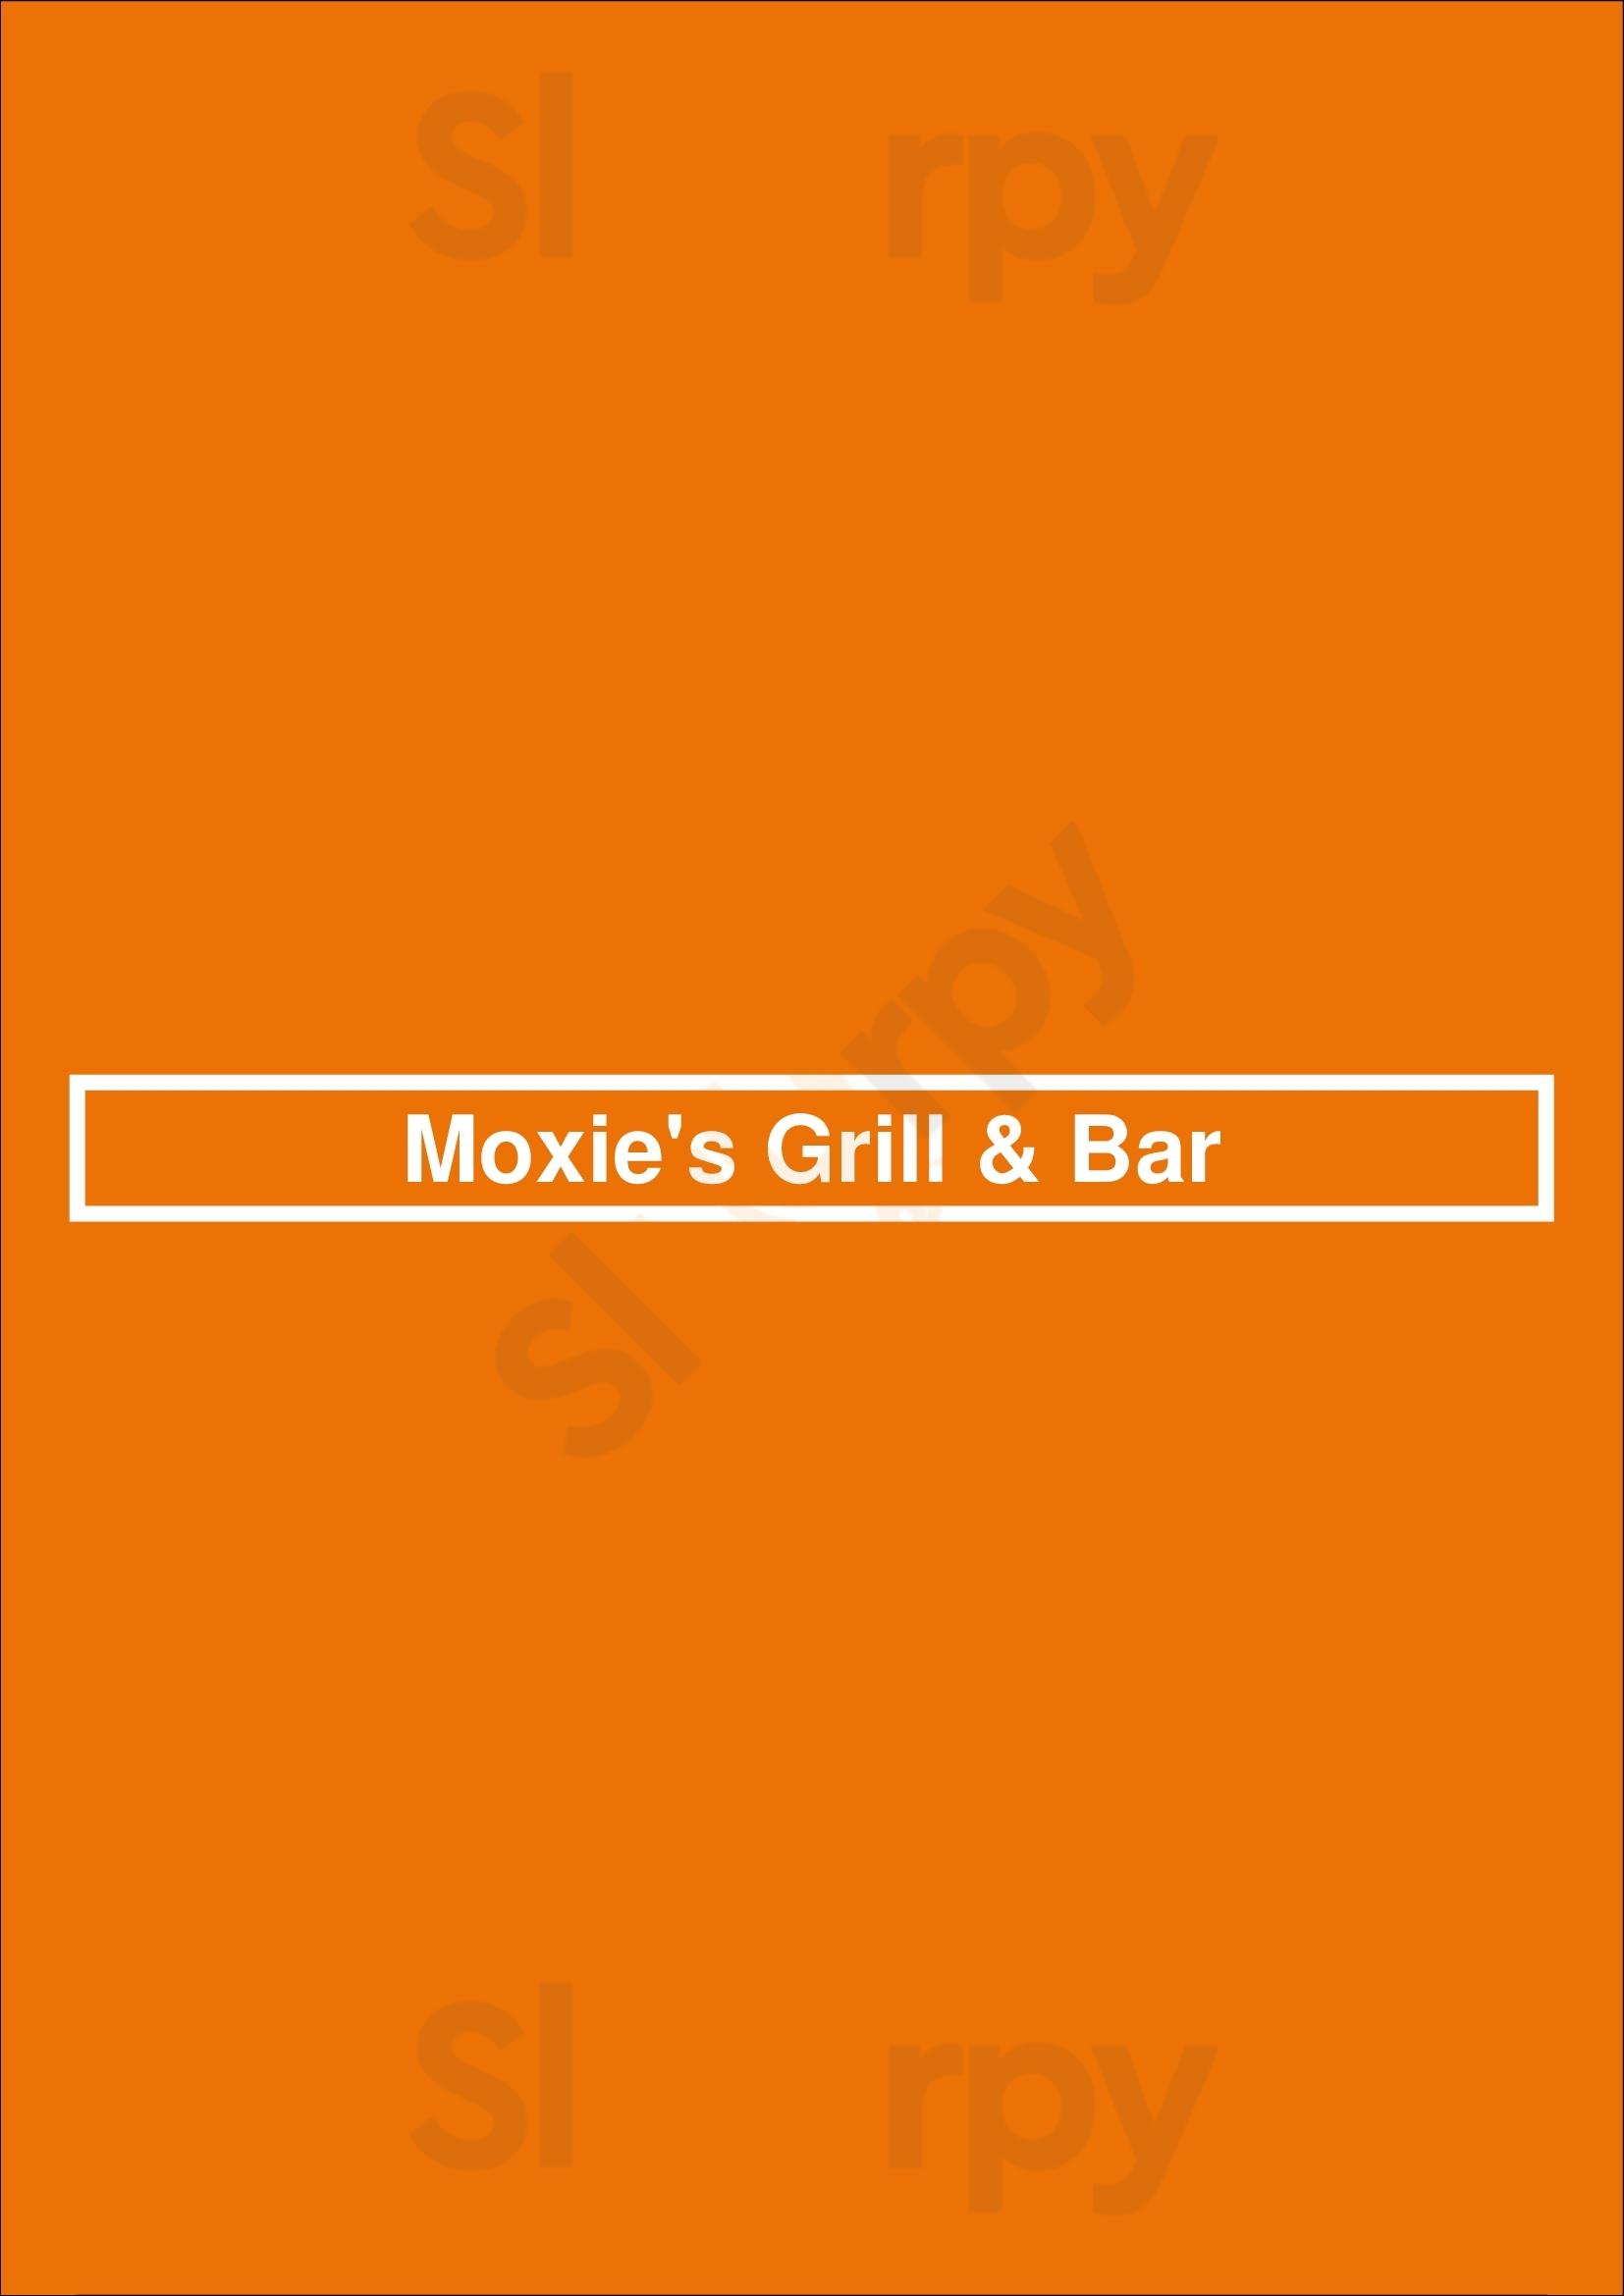 Moxie's Grill & Bar London Menu - 1